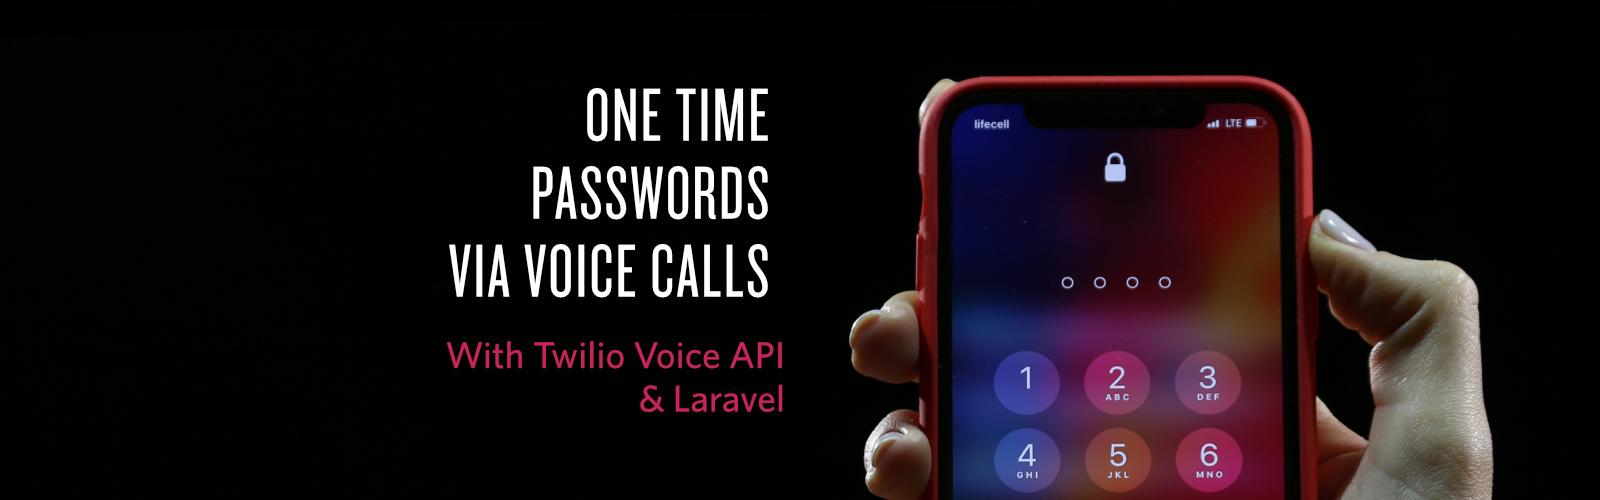 Providing One Time Passwords via Voice Calls with Twilio and Laravel